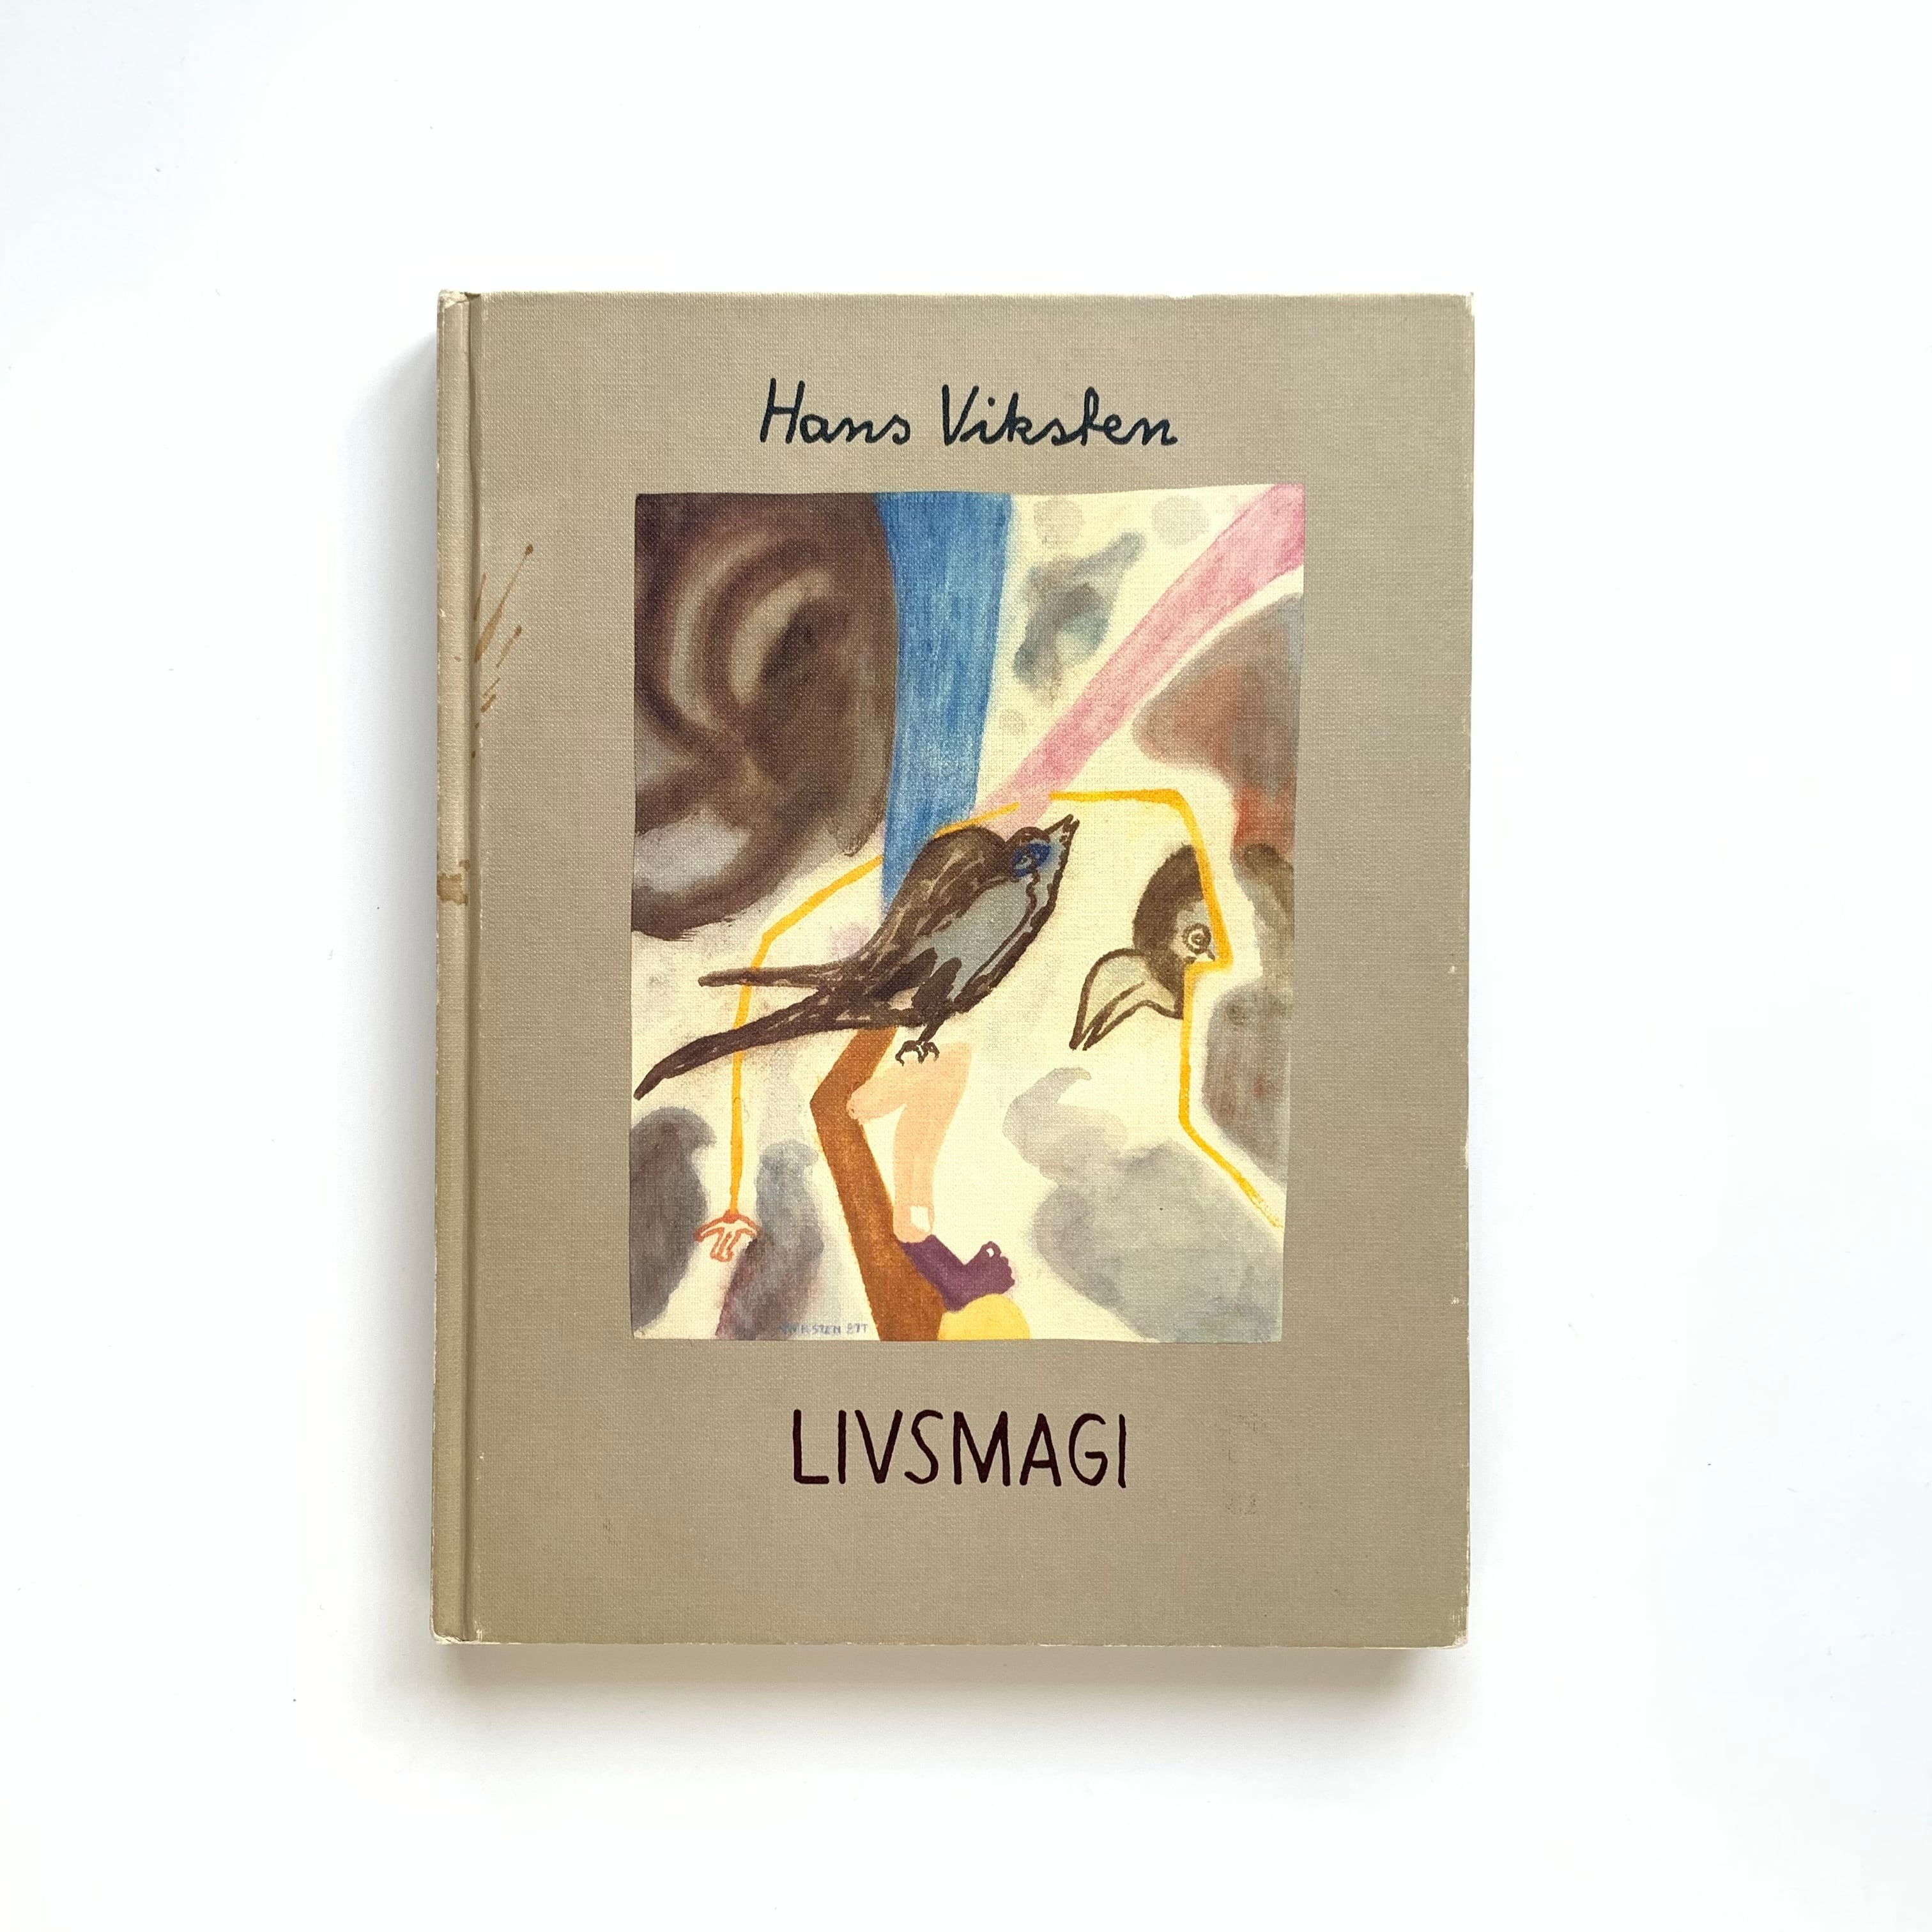 LIVSMAGI / Hans Viksten